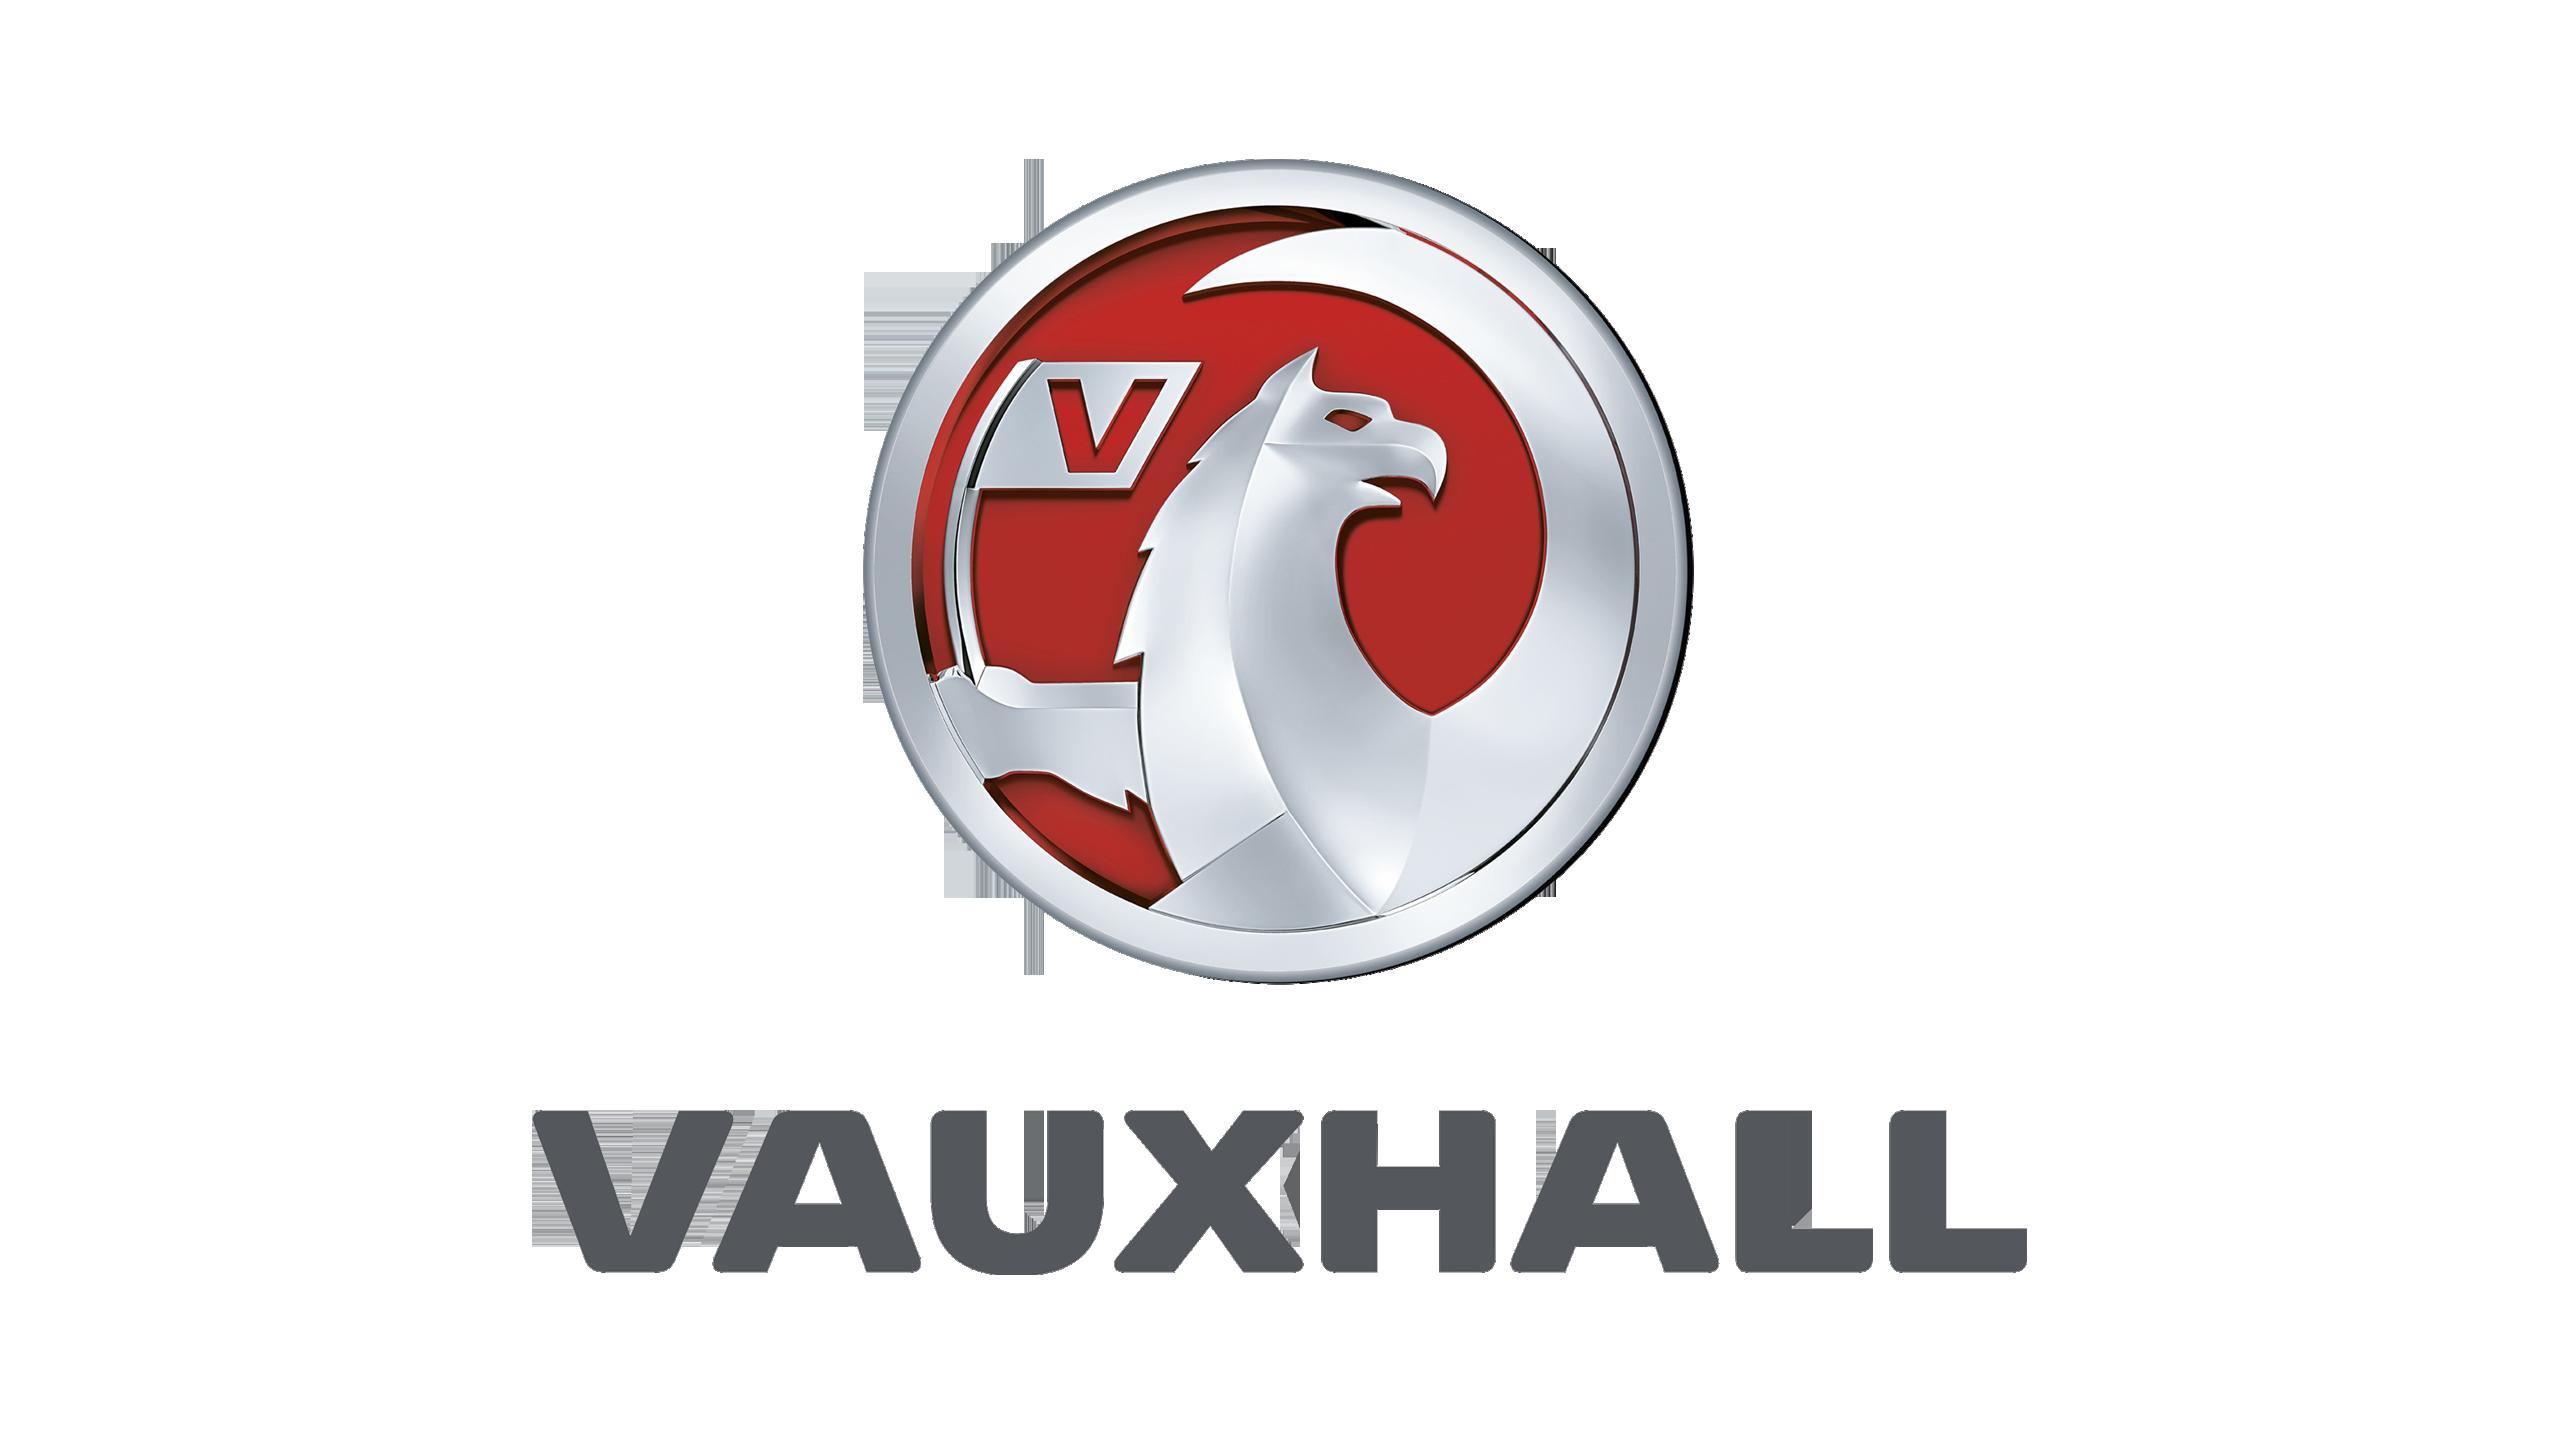 Vauxhall logp